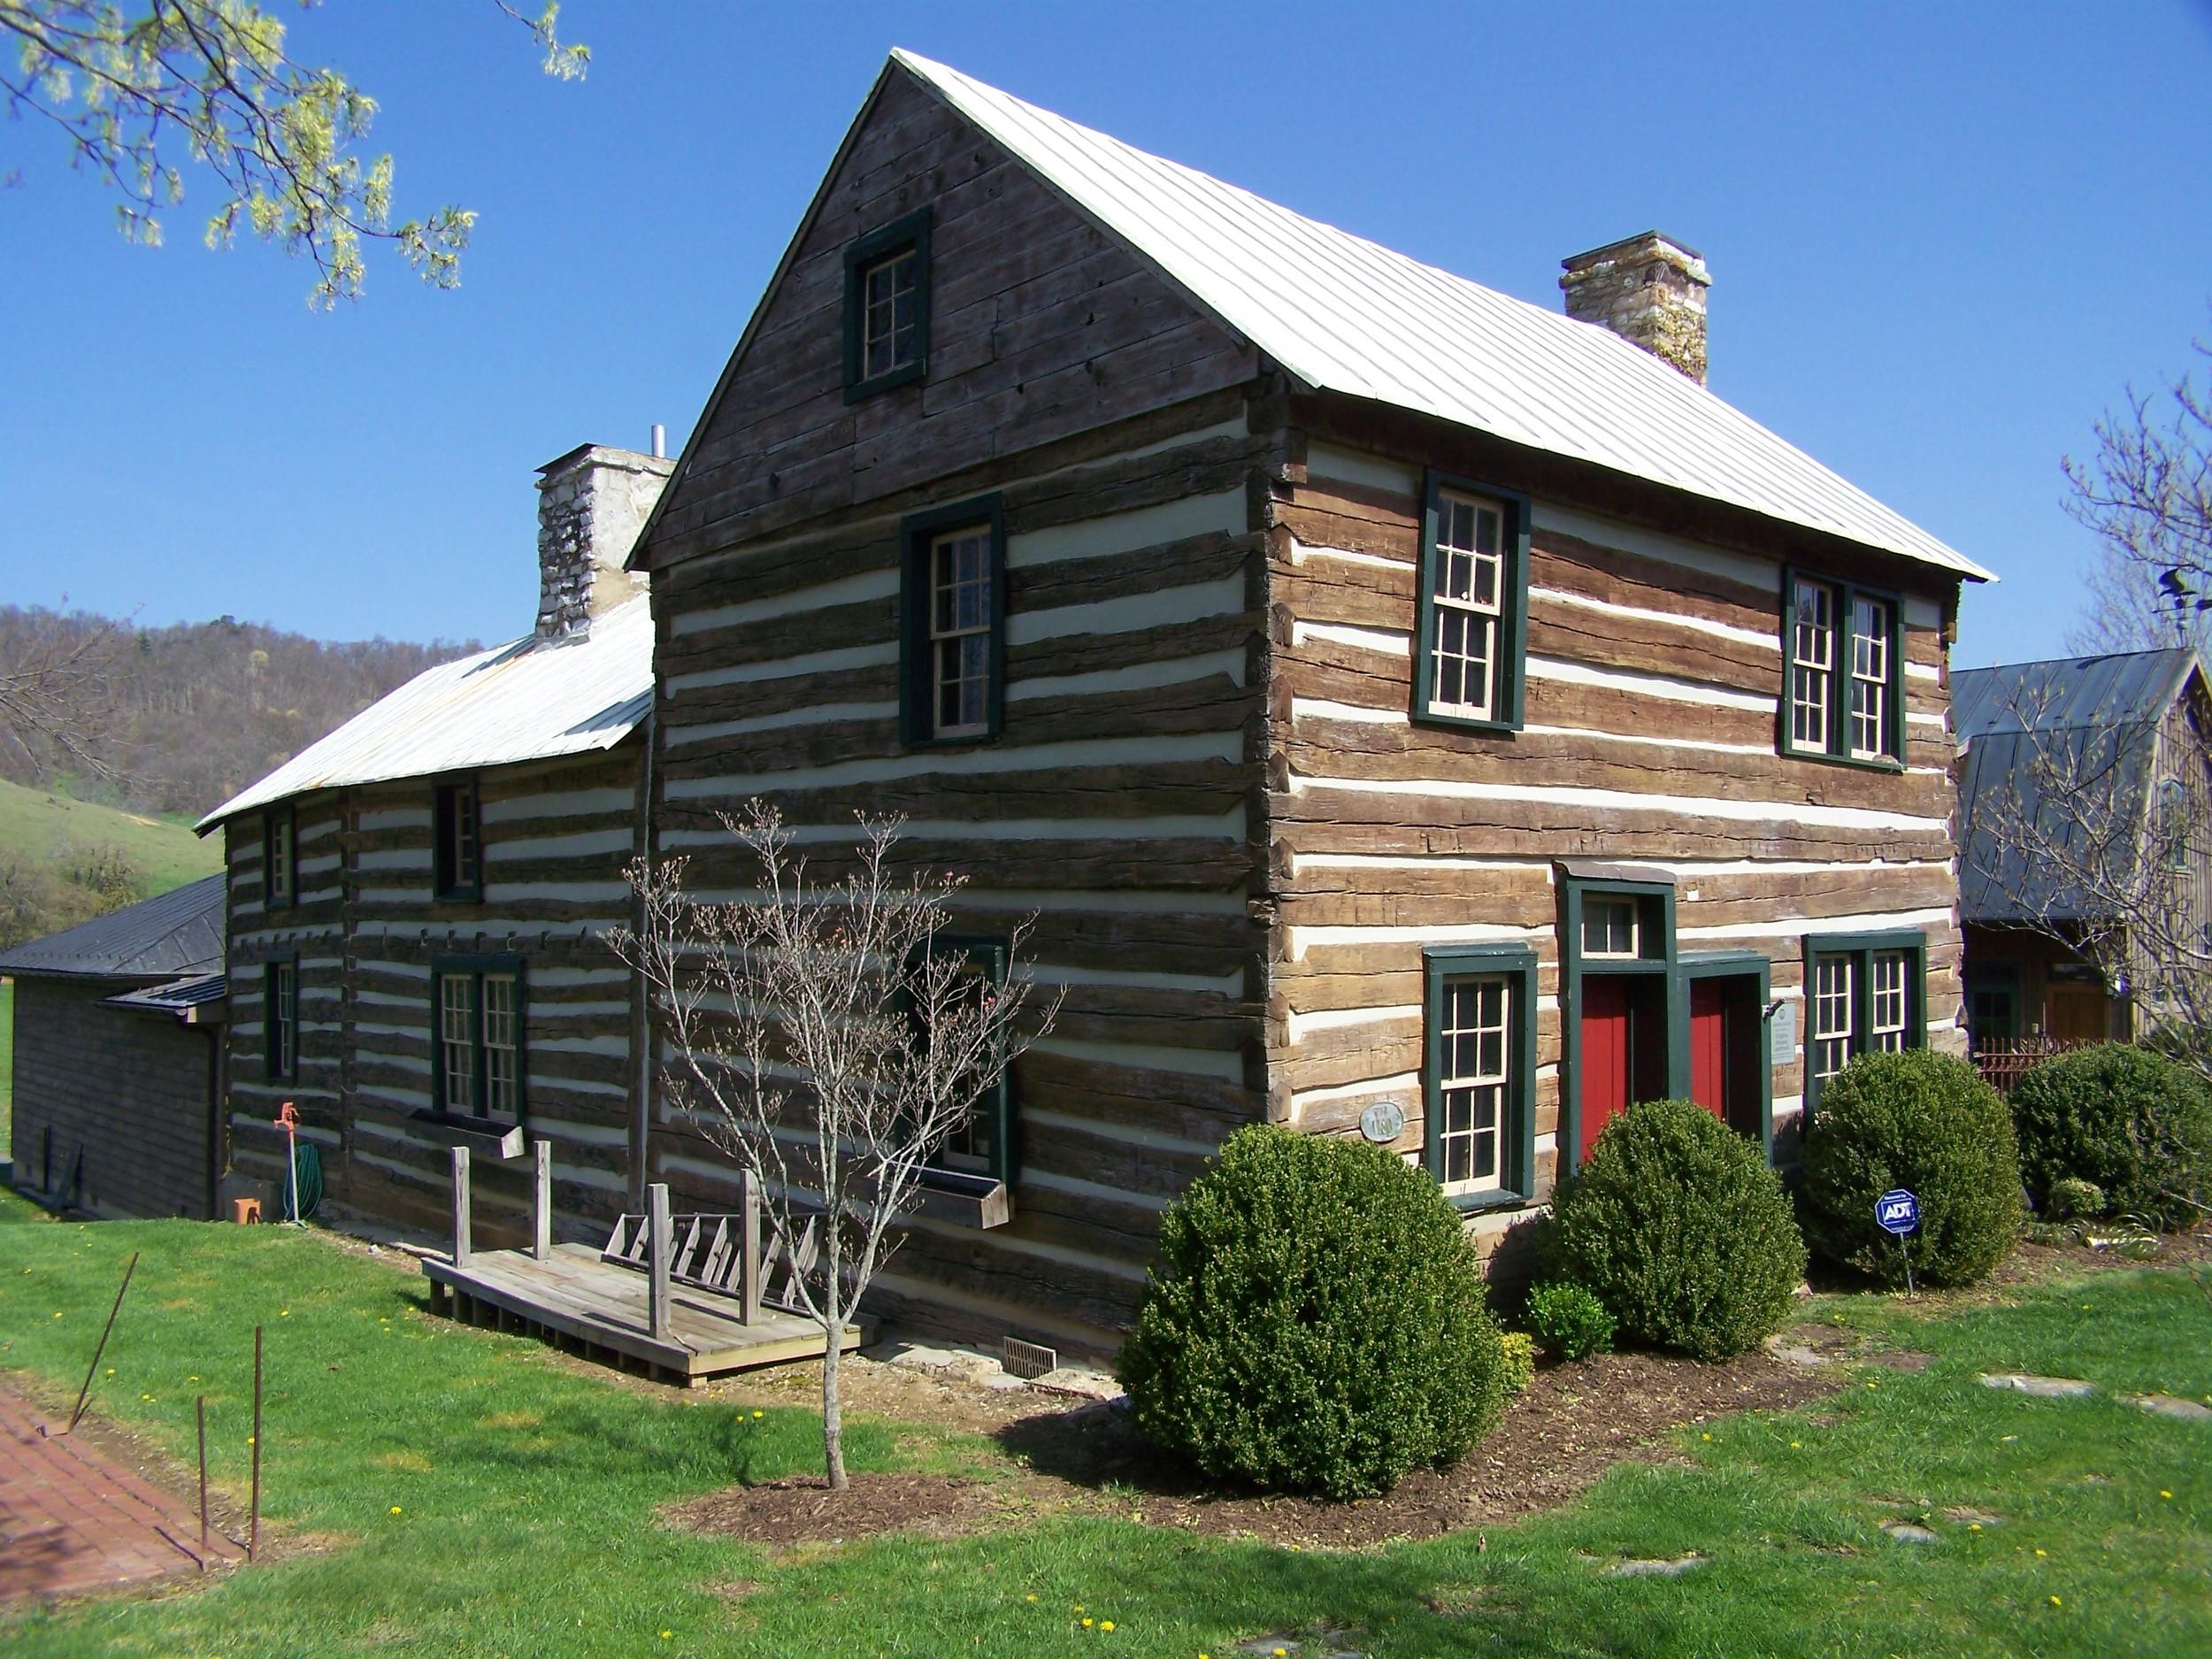 Historic 1780 Mustoe House South of Hot Springs, VA